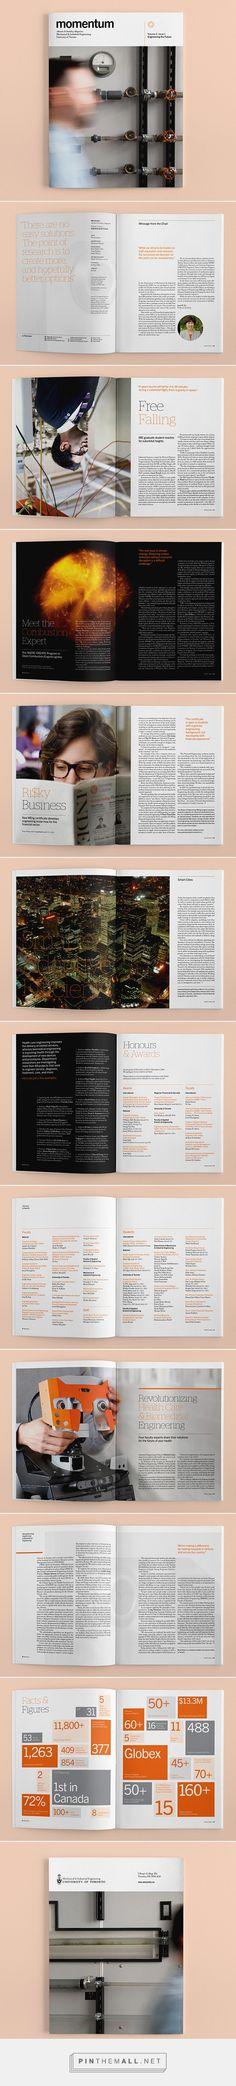 Momentum magazine Edited by University of Toronto